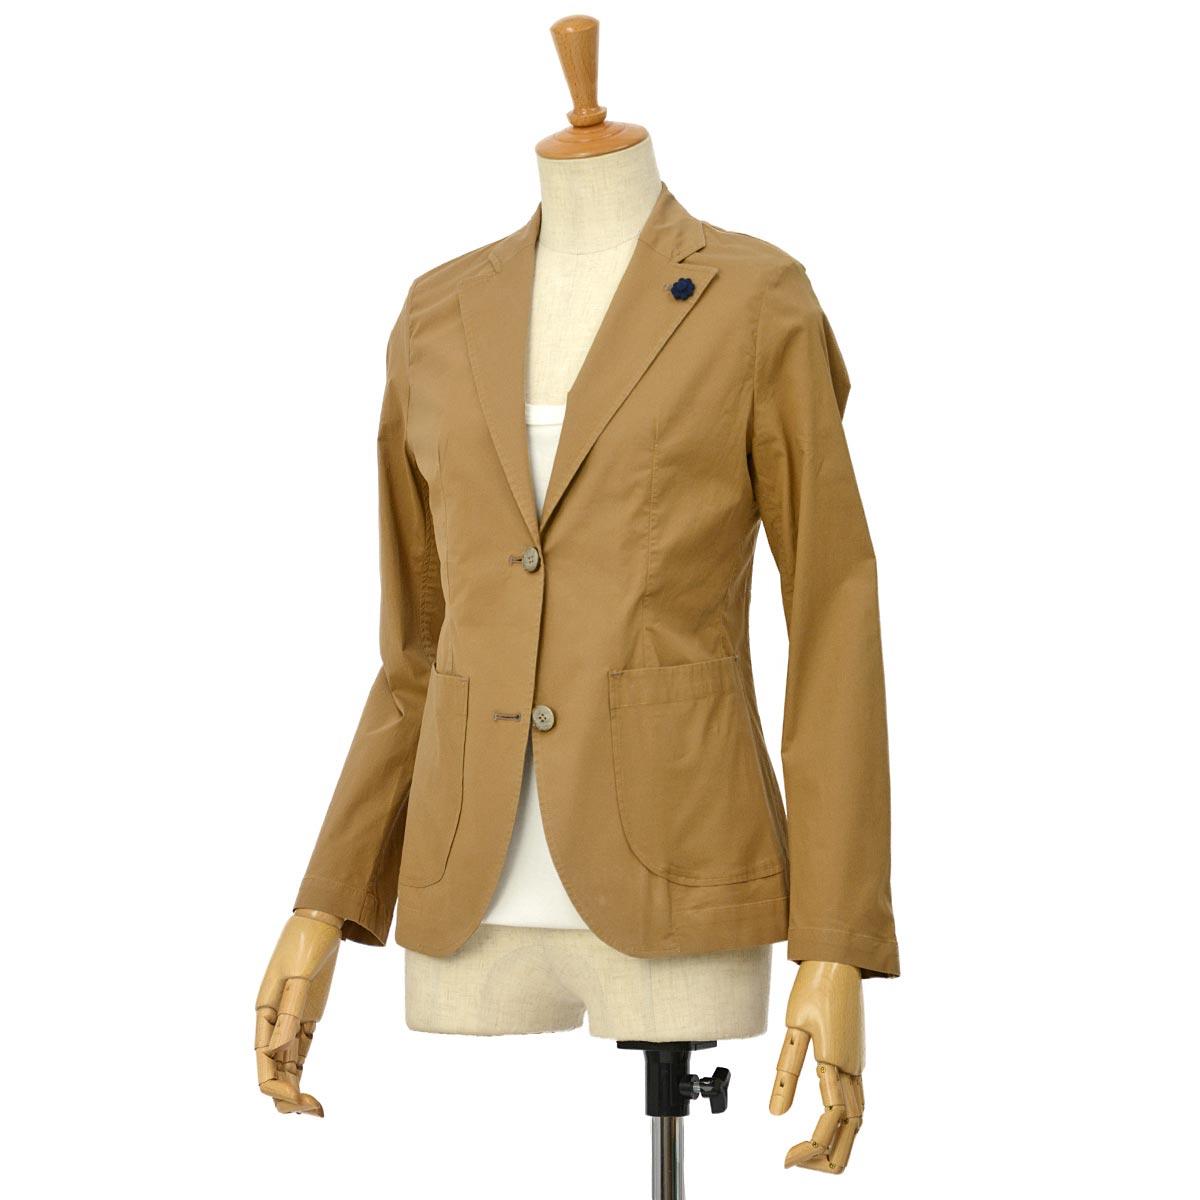 LARDINI【ラルディーニ】シャツジャケット LIRA EGC52416 2 コットン ベージュ